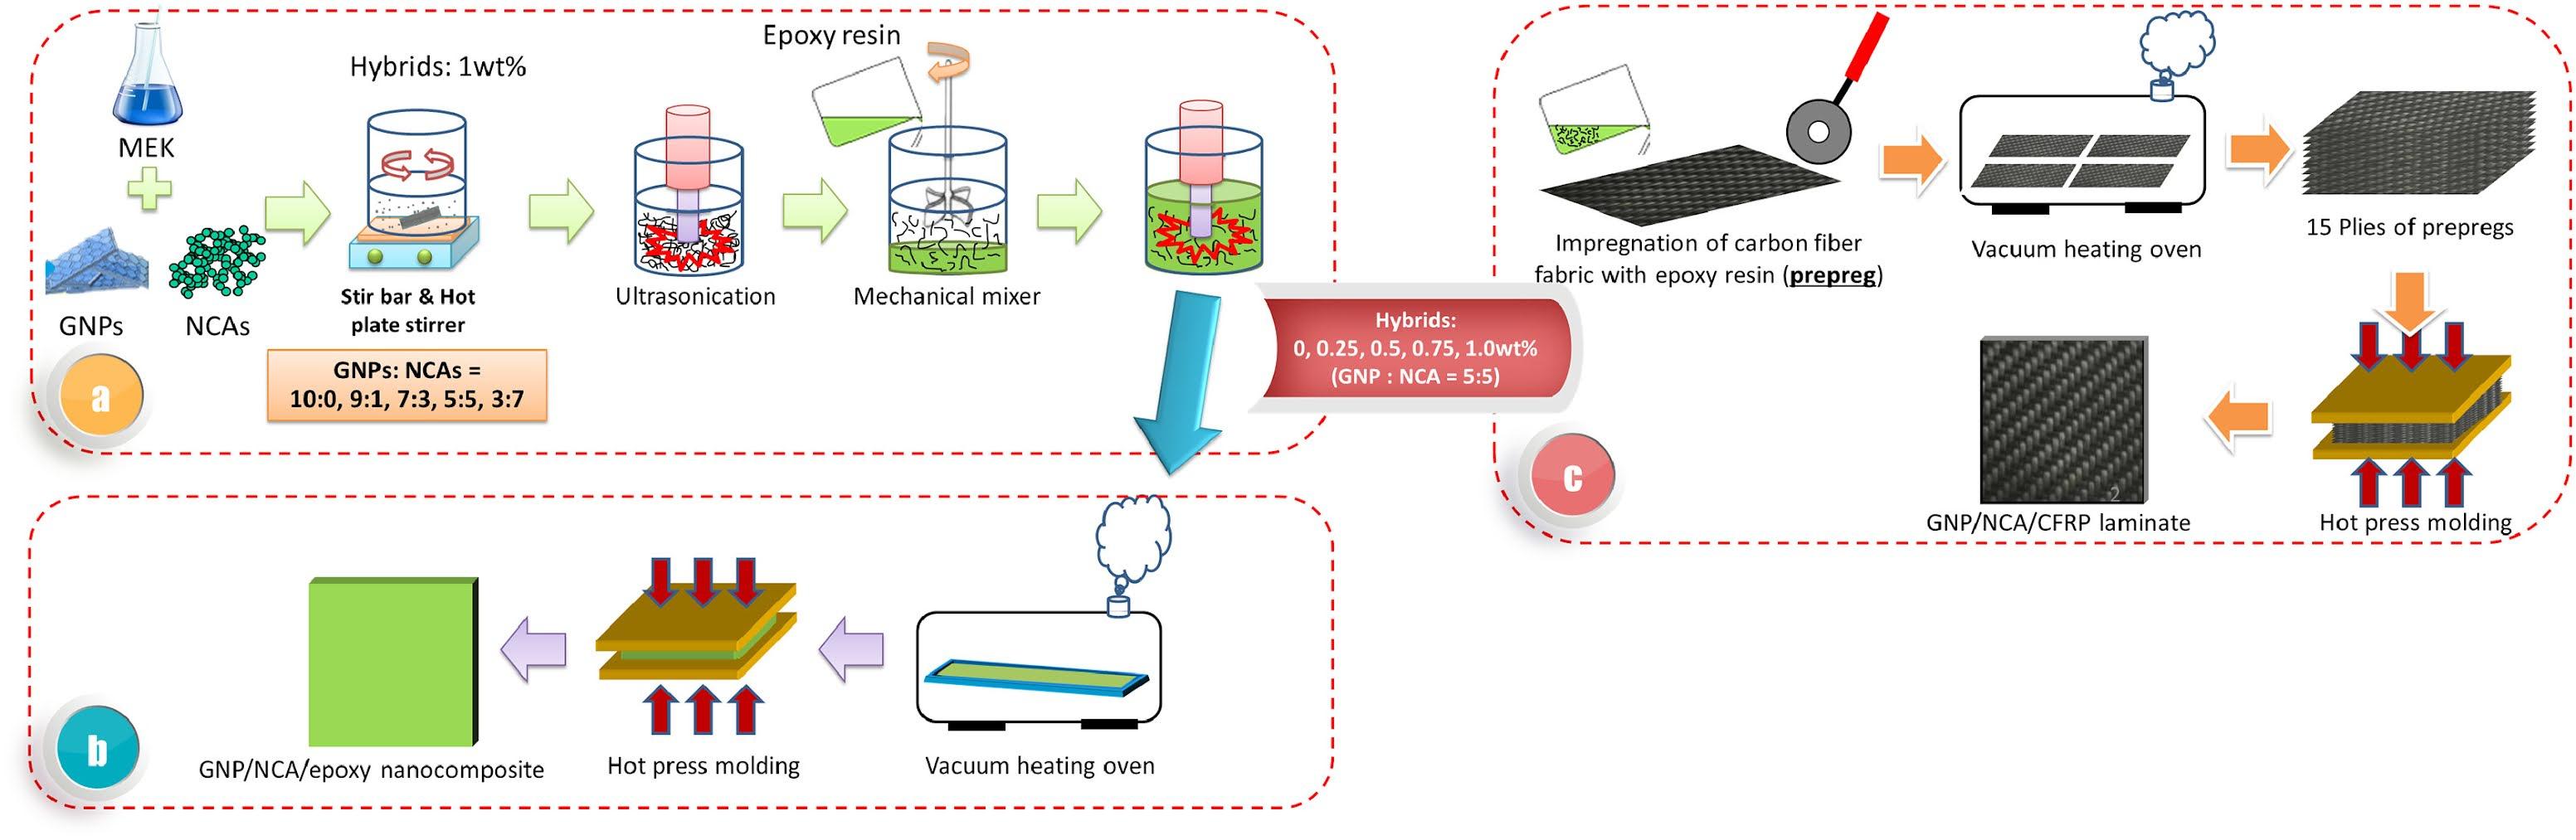 Graphene and nanocomposites